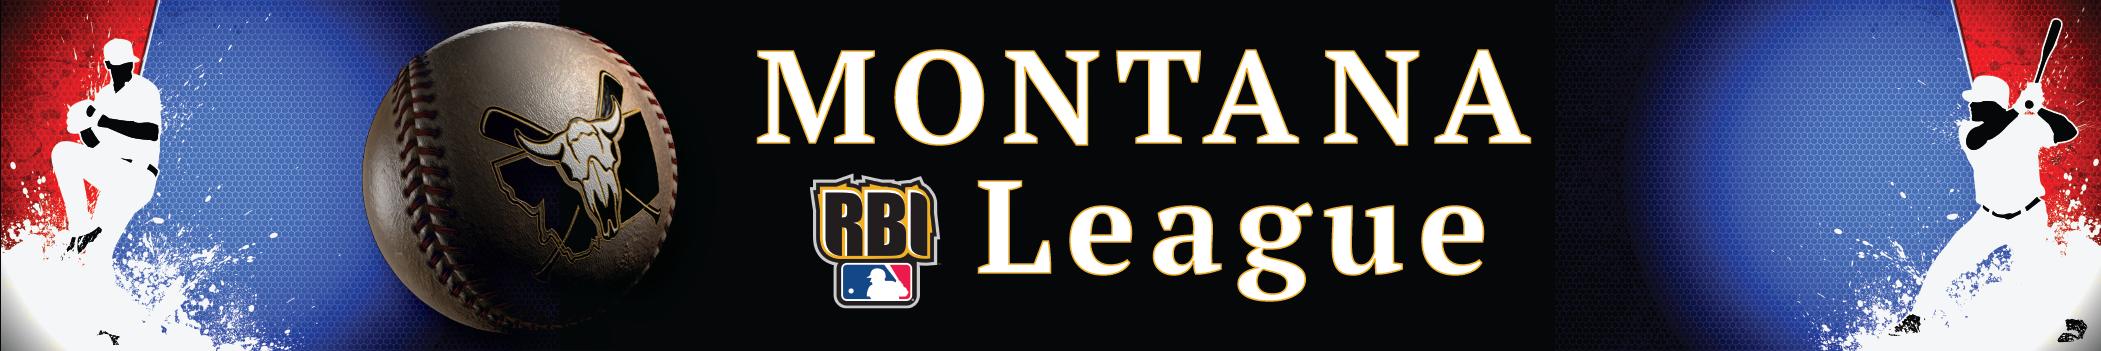 Montana rbi league banner